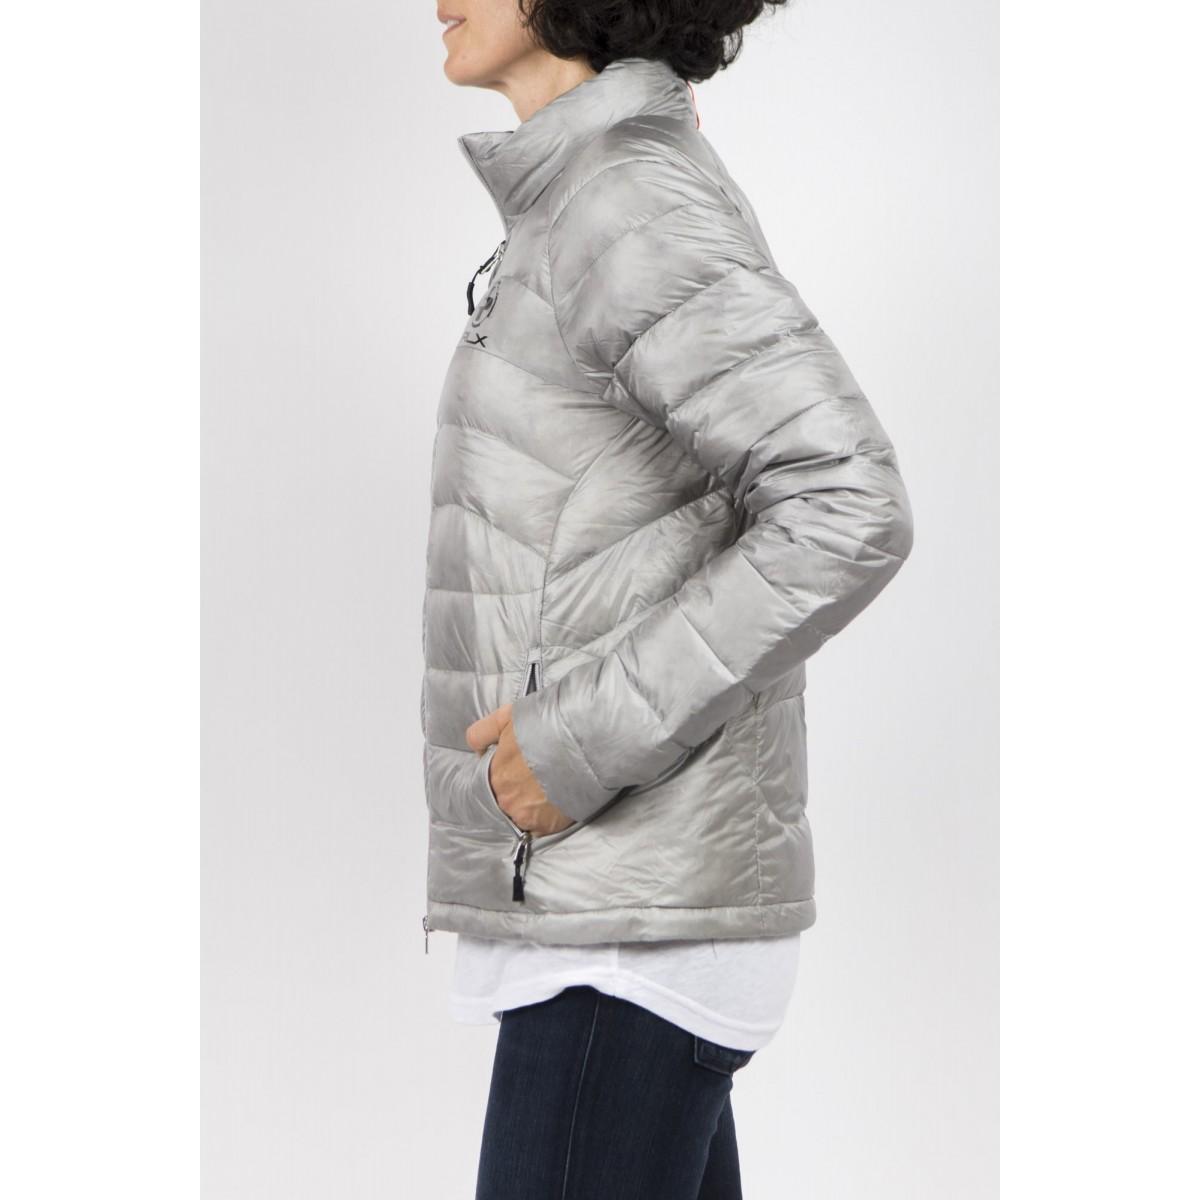 Daunenjacken Polo Ralph Lauren Frauen - V30Ioexpj659 Silver- B0511